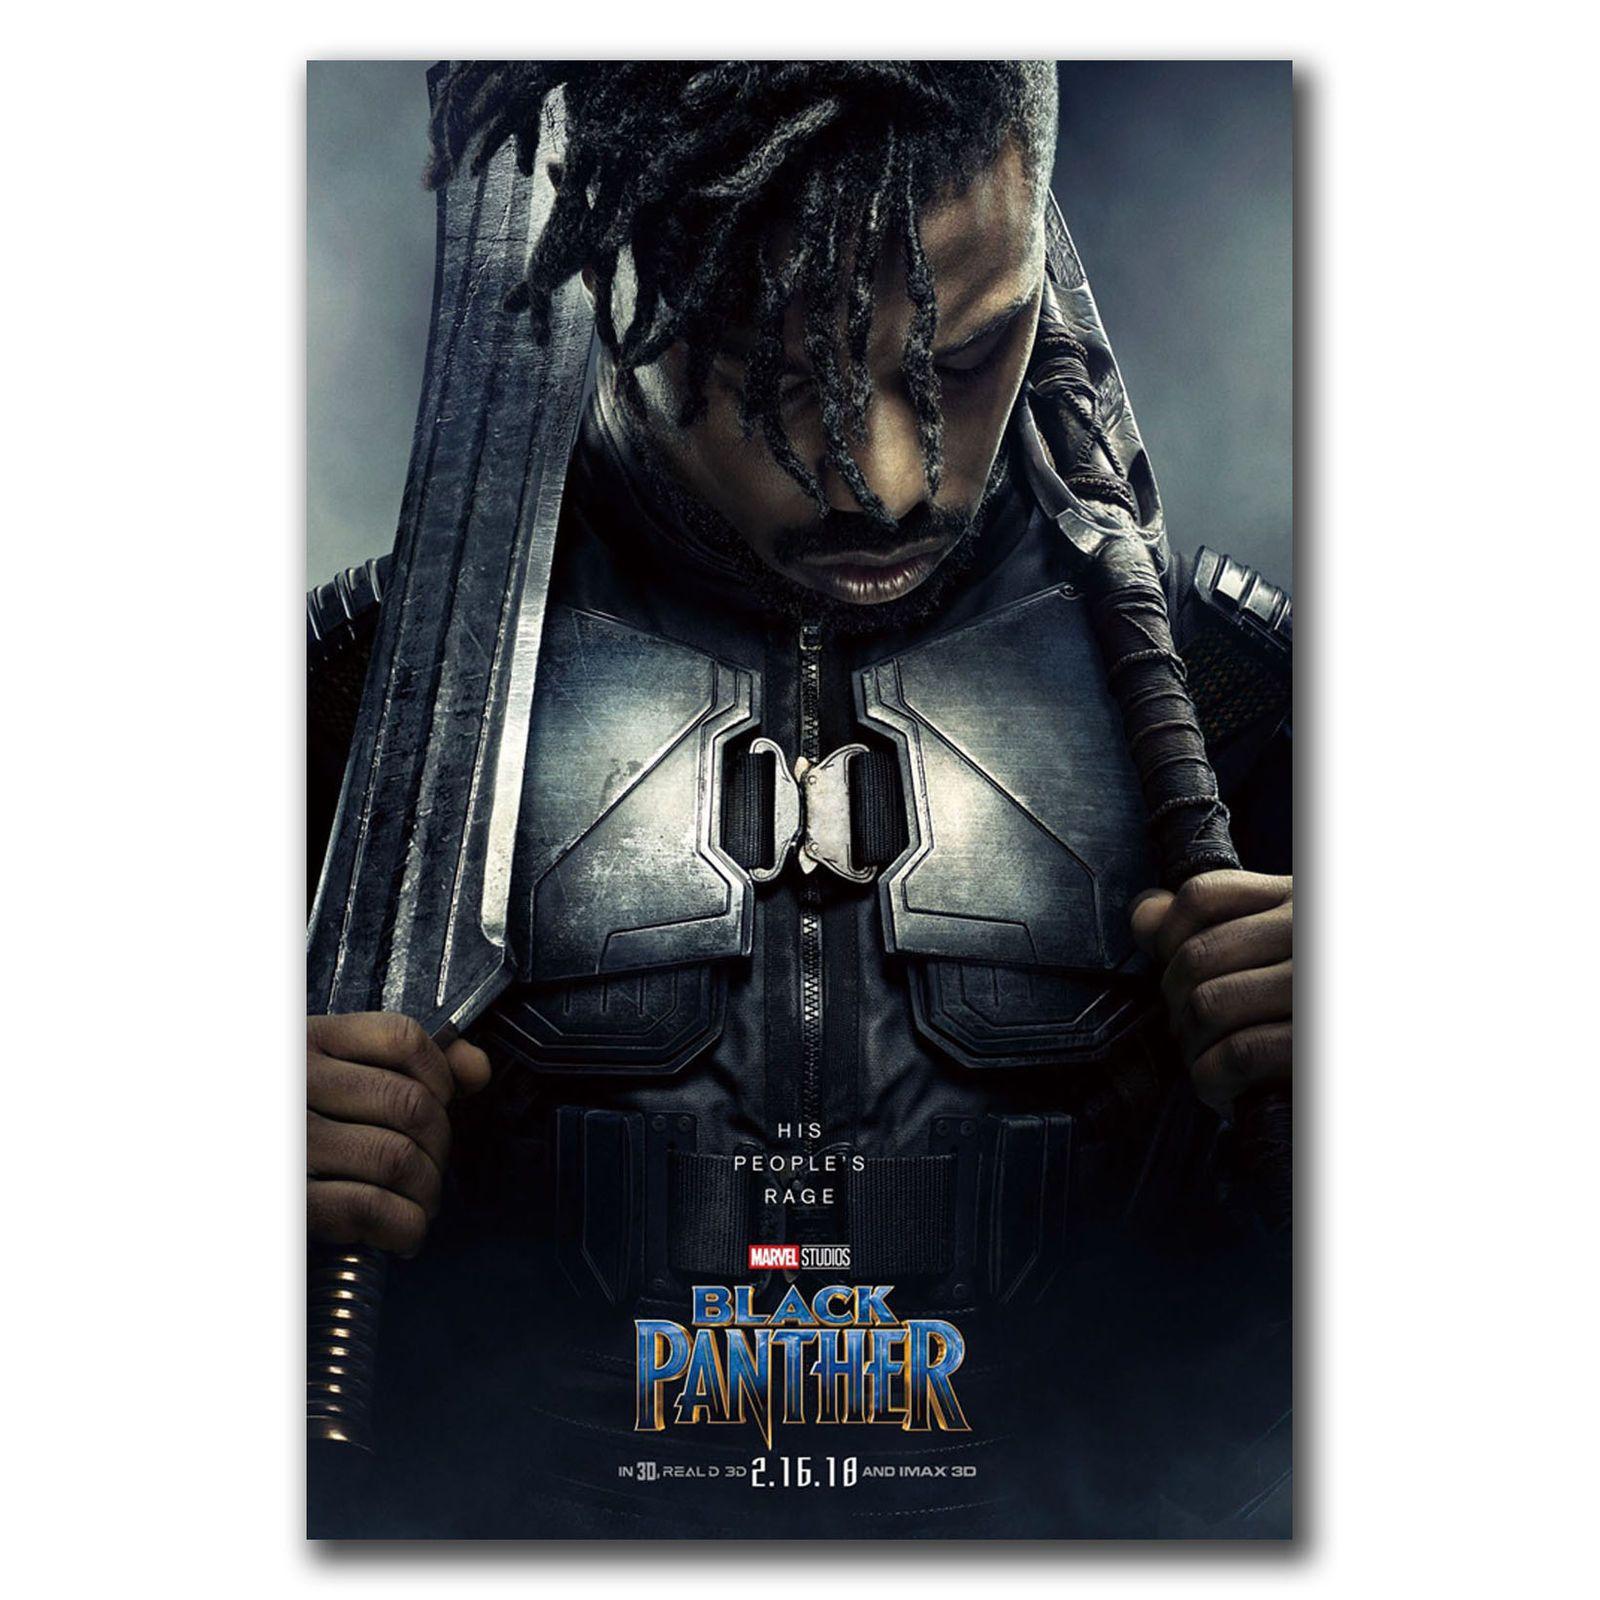 455 e2839 art black panther dc marvel movie 2018